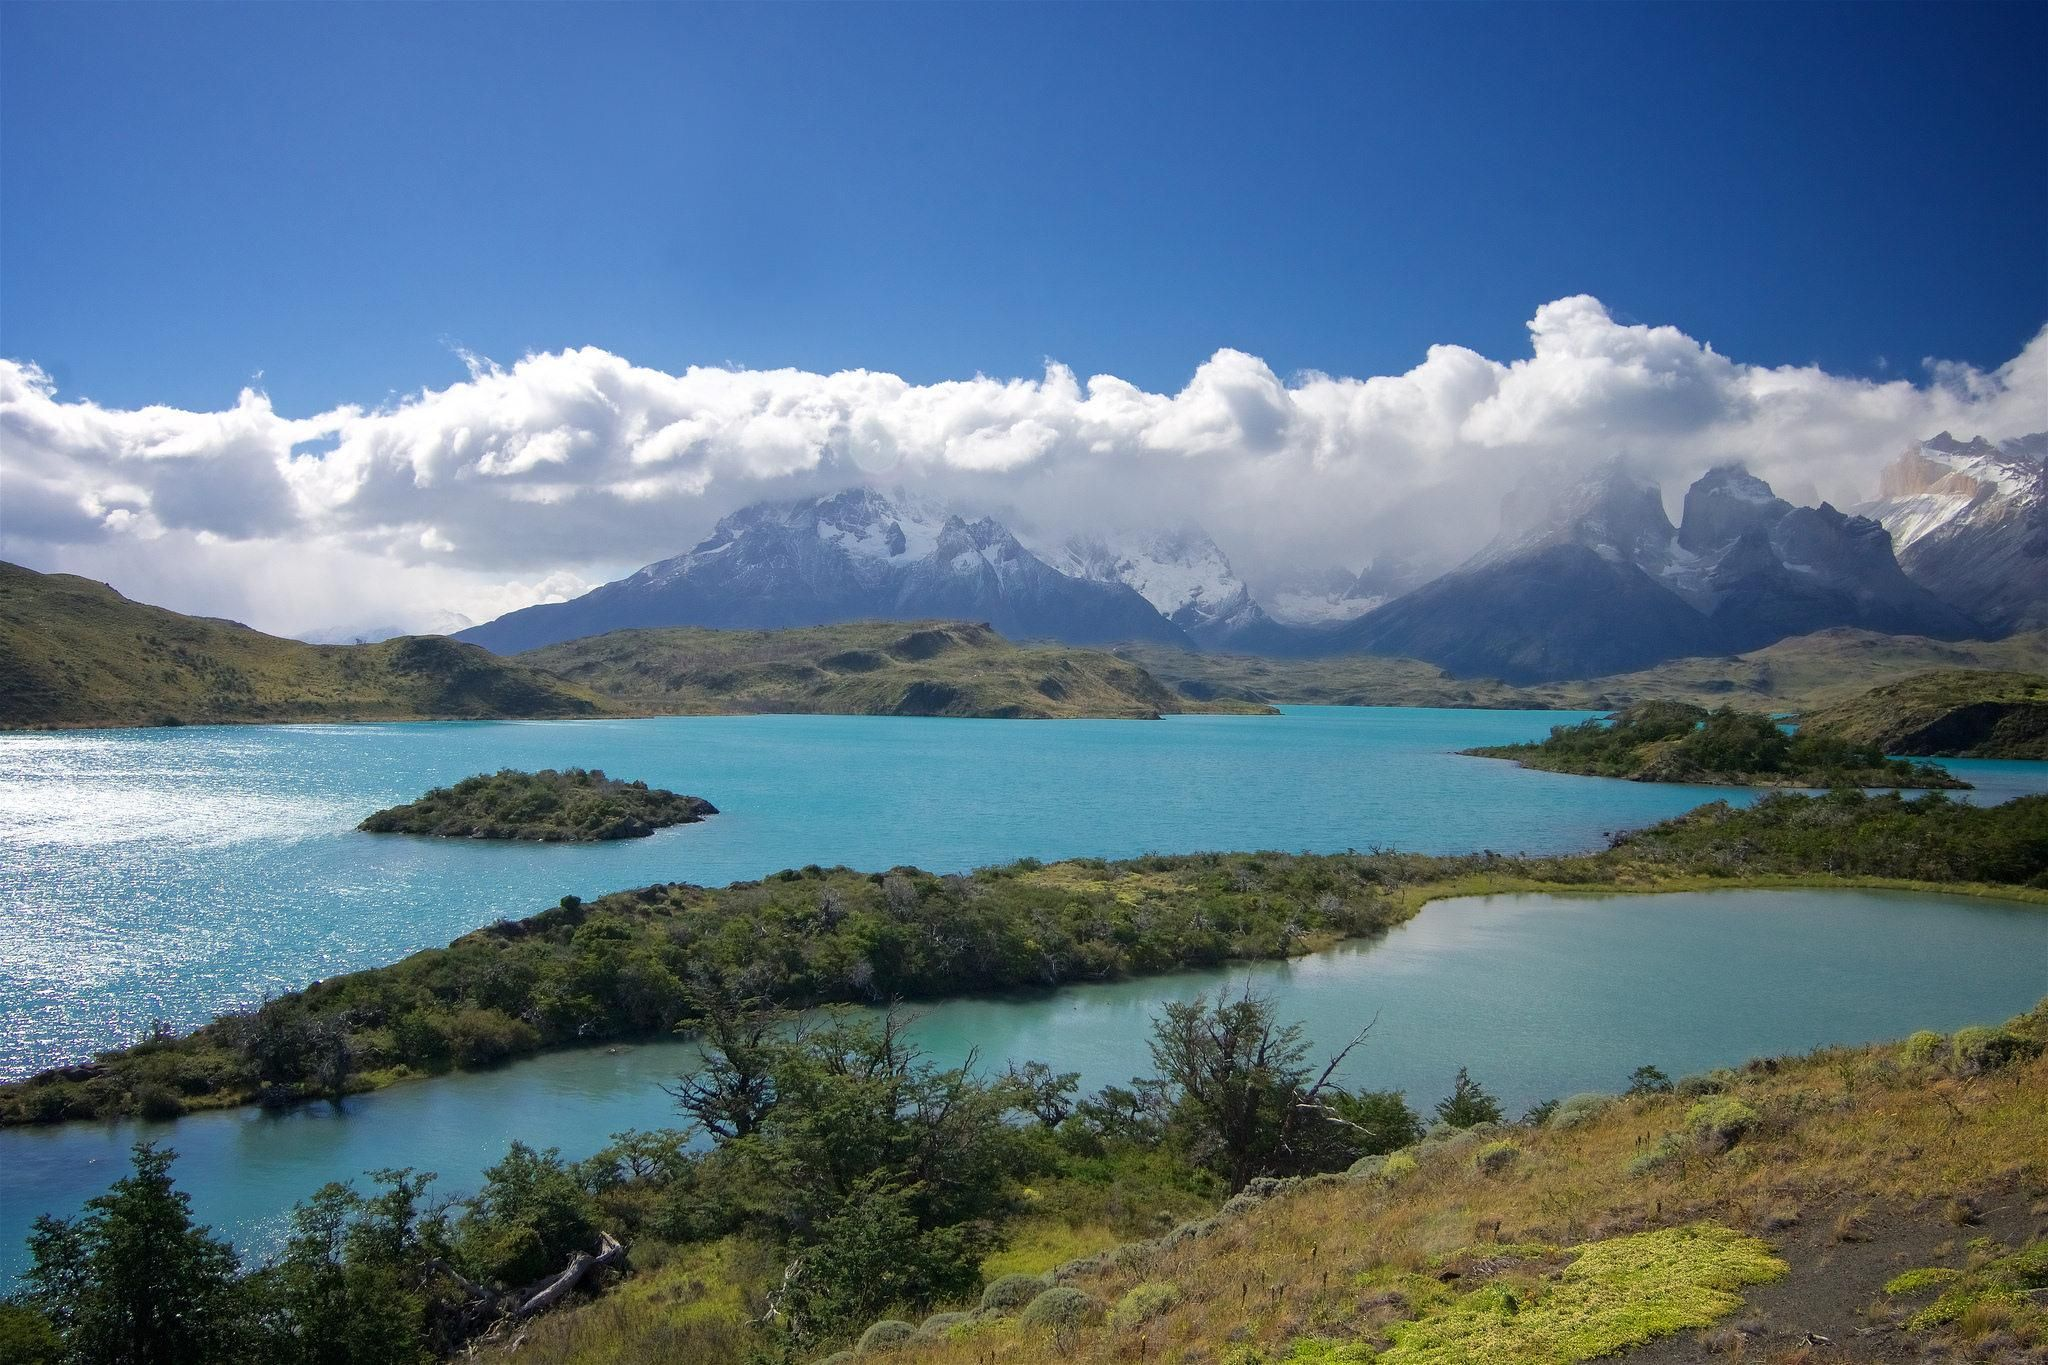 Torres del Paine National Park Patagonia [2048x1365][OC